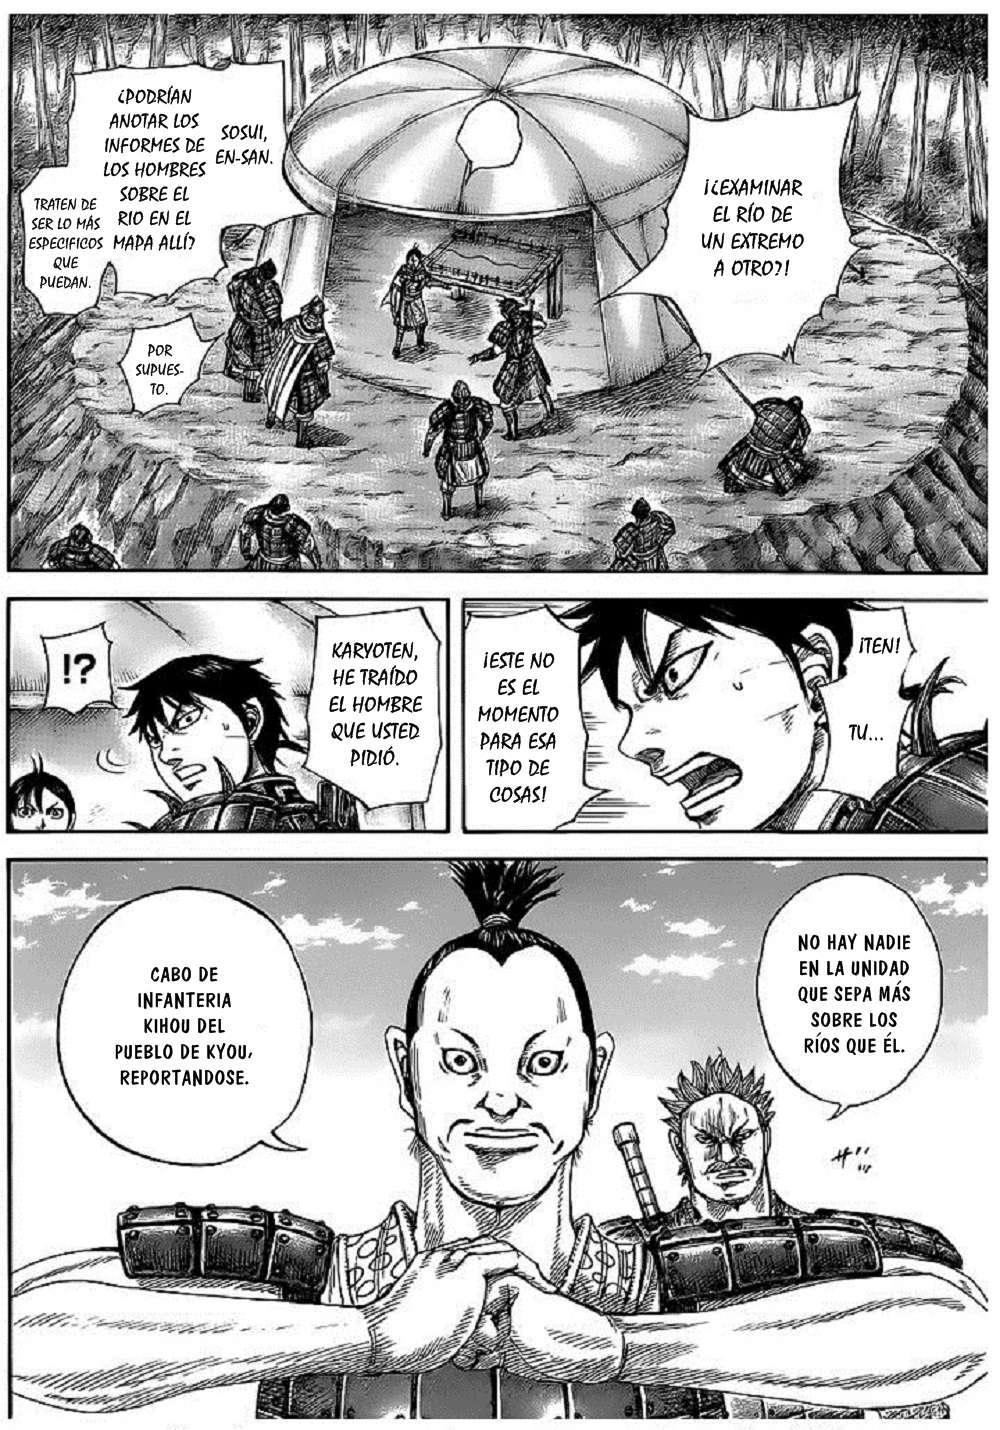 http://c5.ninemanga.com/es_manga/19/12307/431197/1bd28104c466d9f78b0b025a6469e56f.jpg Page 5